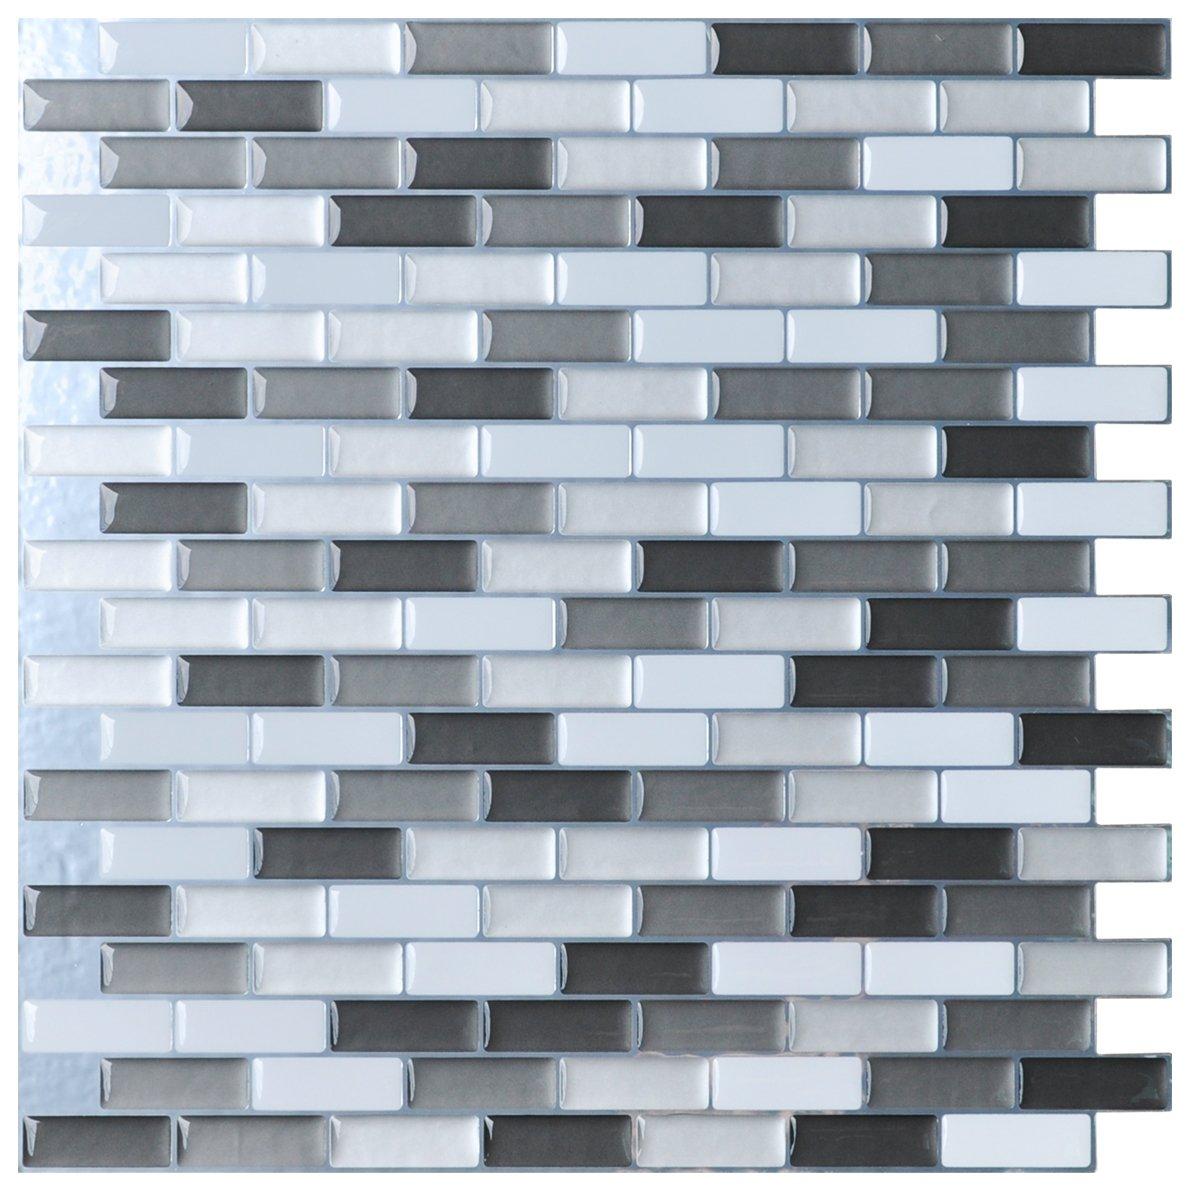 Art3d Peel-N-Stick Kitchen Backsplash Wall Tile Vinyl Wall Sticker, 12' x 12' Pack of 6 12 x 12 Pack of 6 6165173